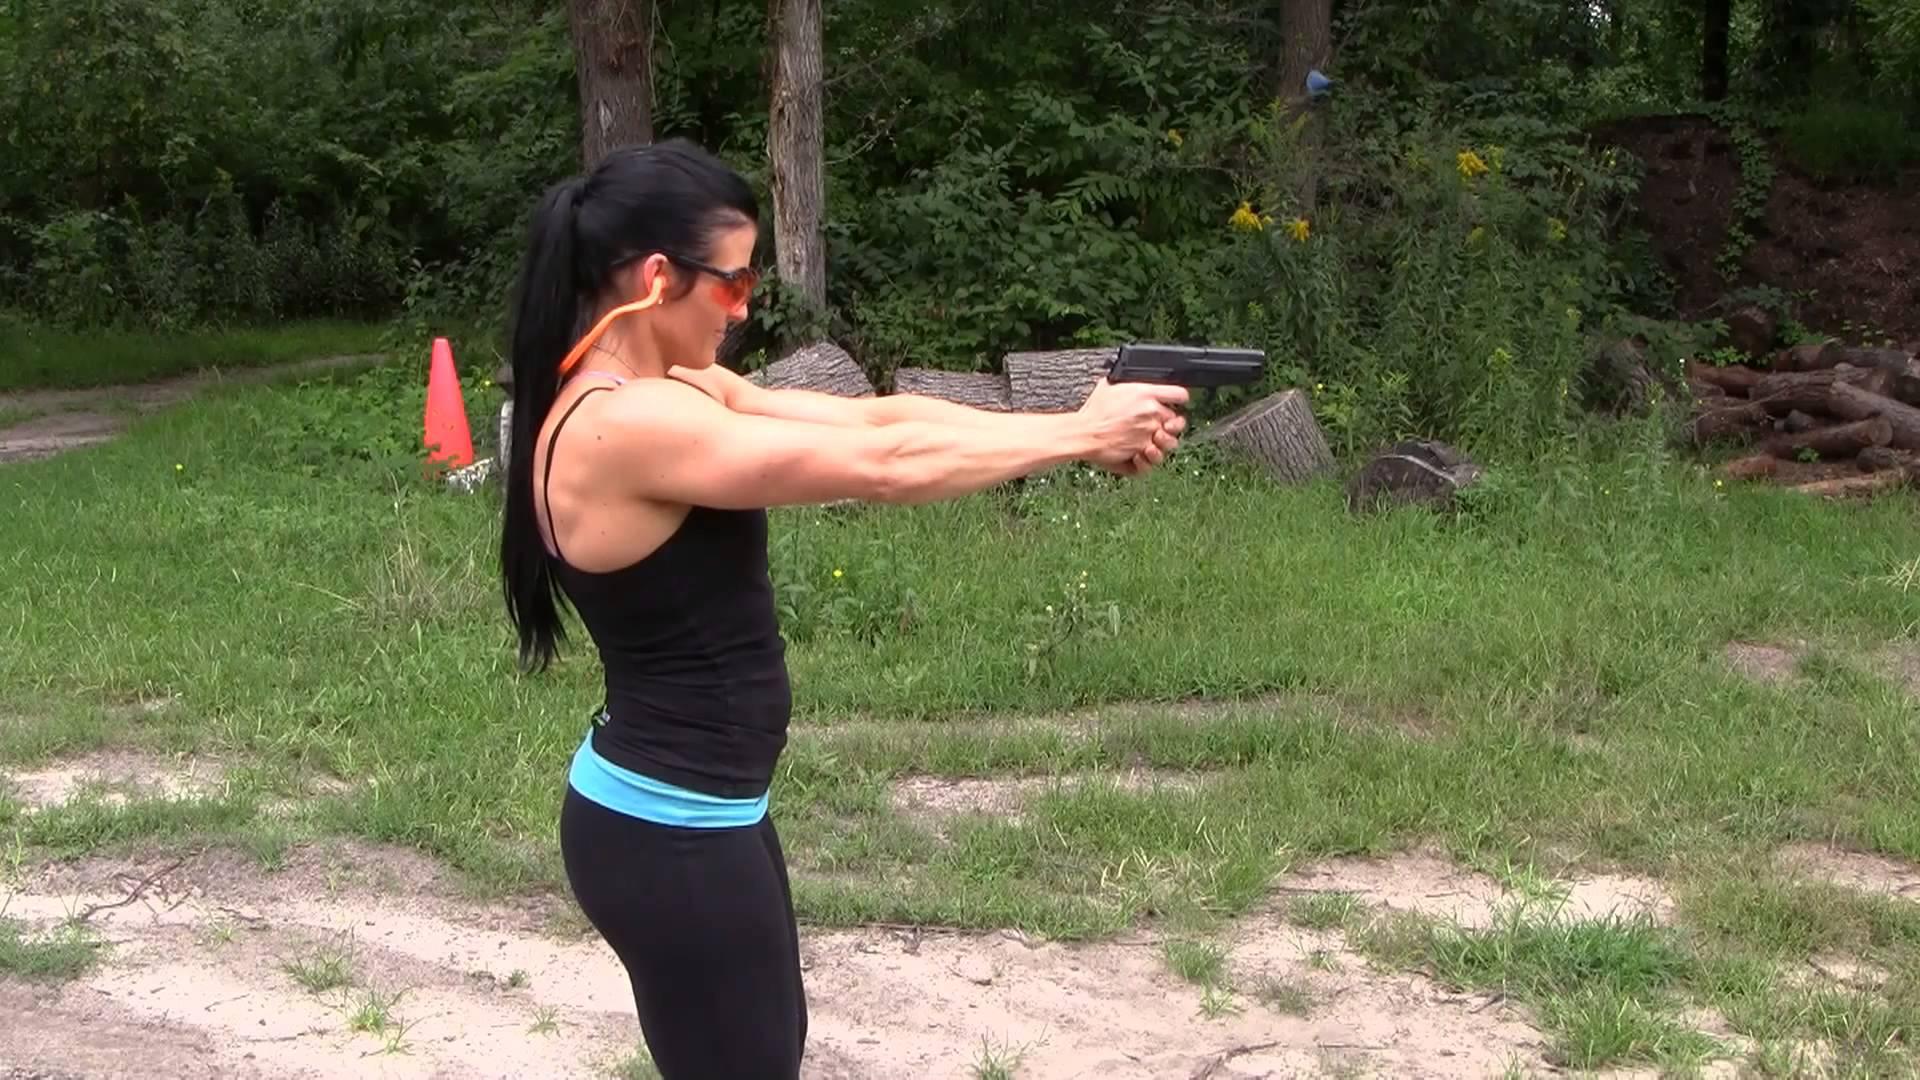 Rebekah Saryn Shooting a Sig P228